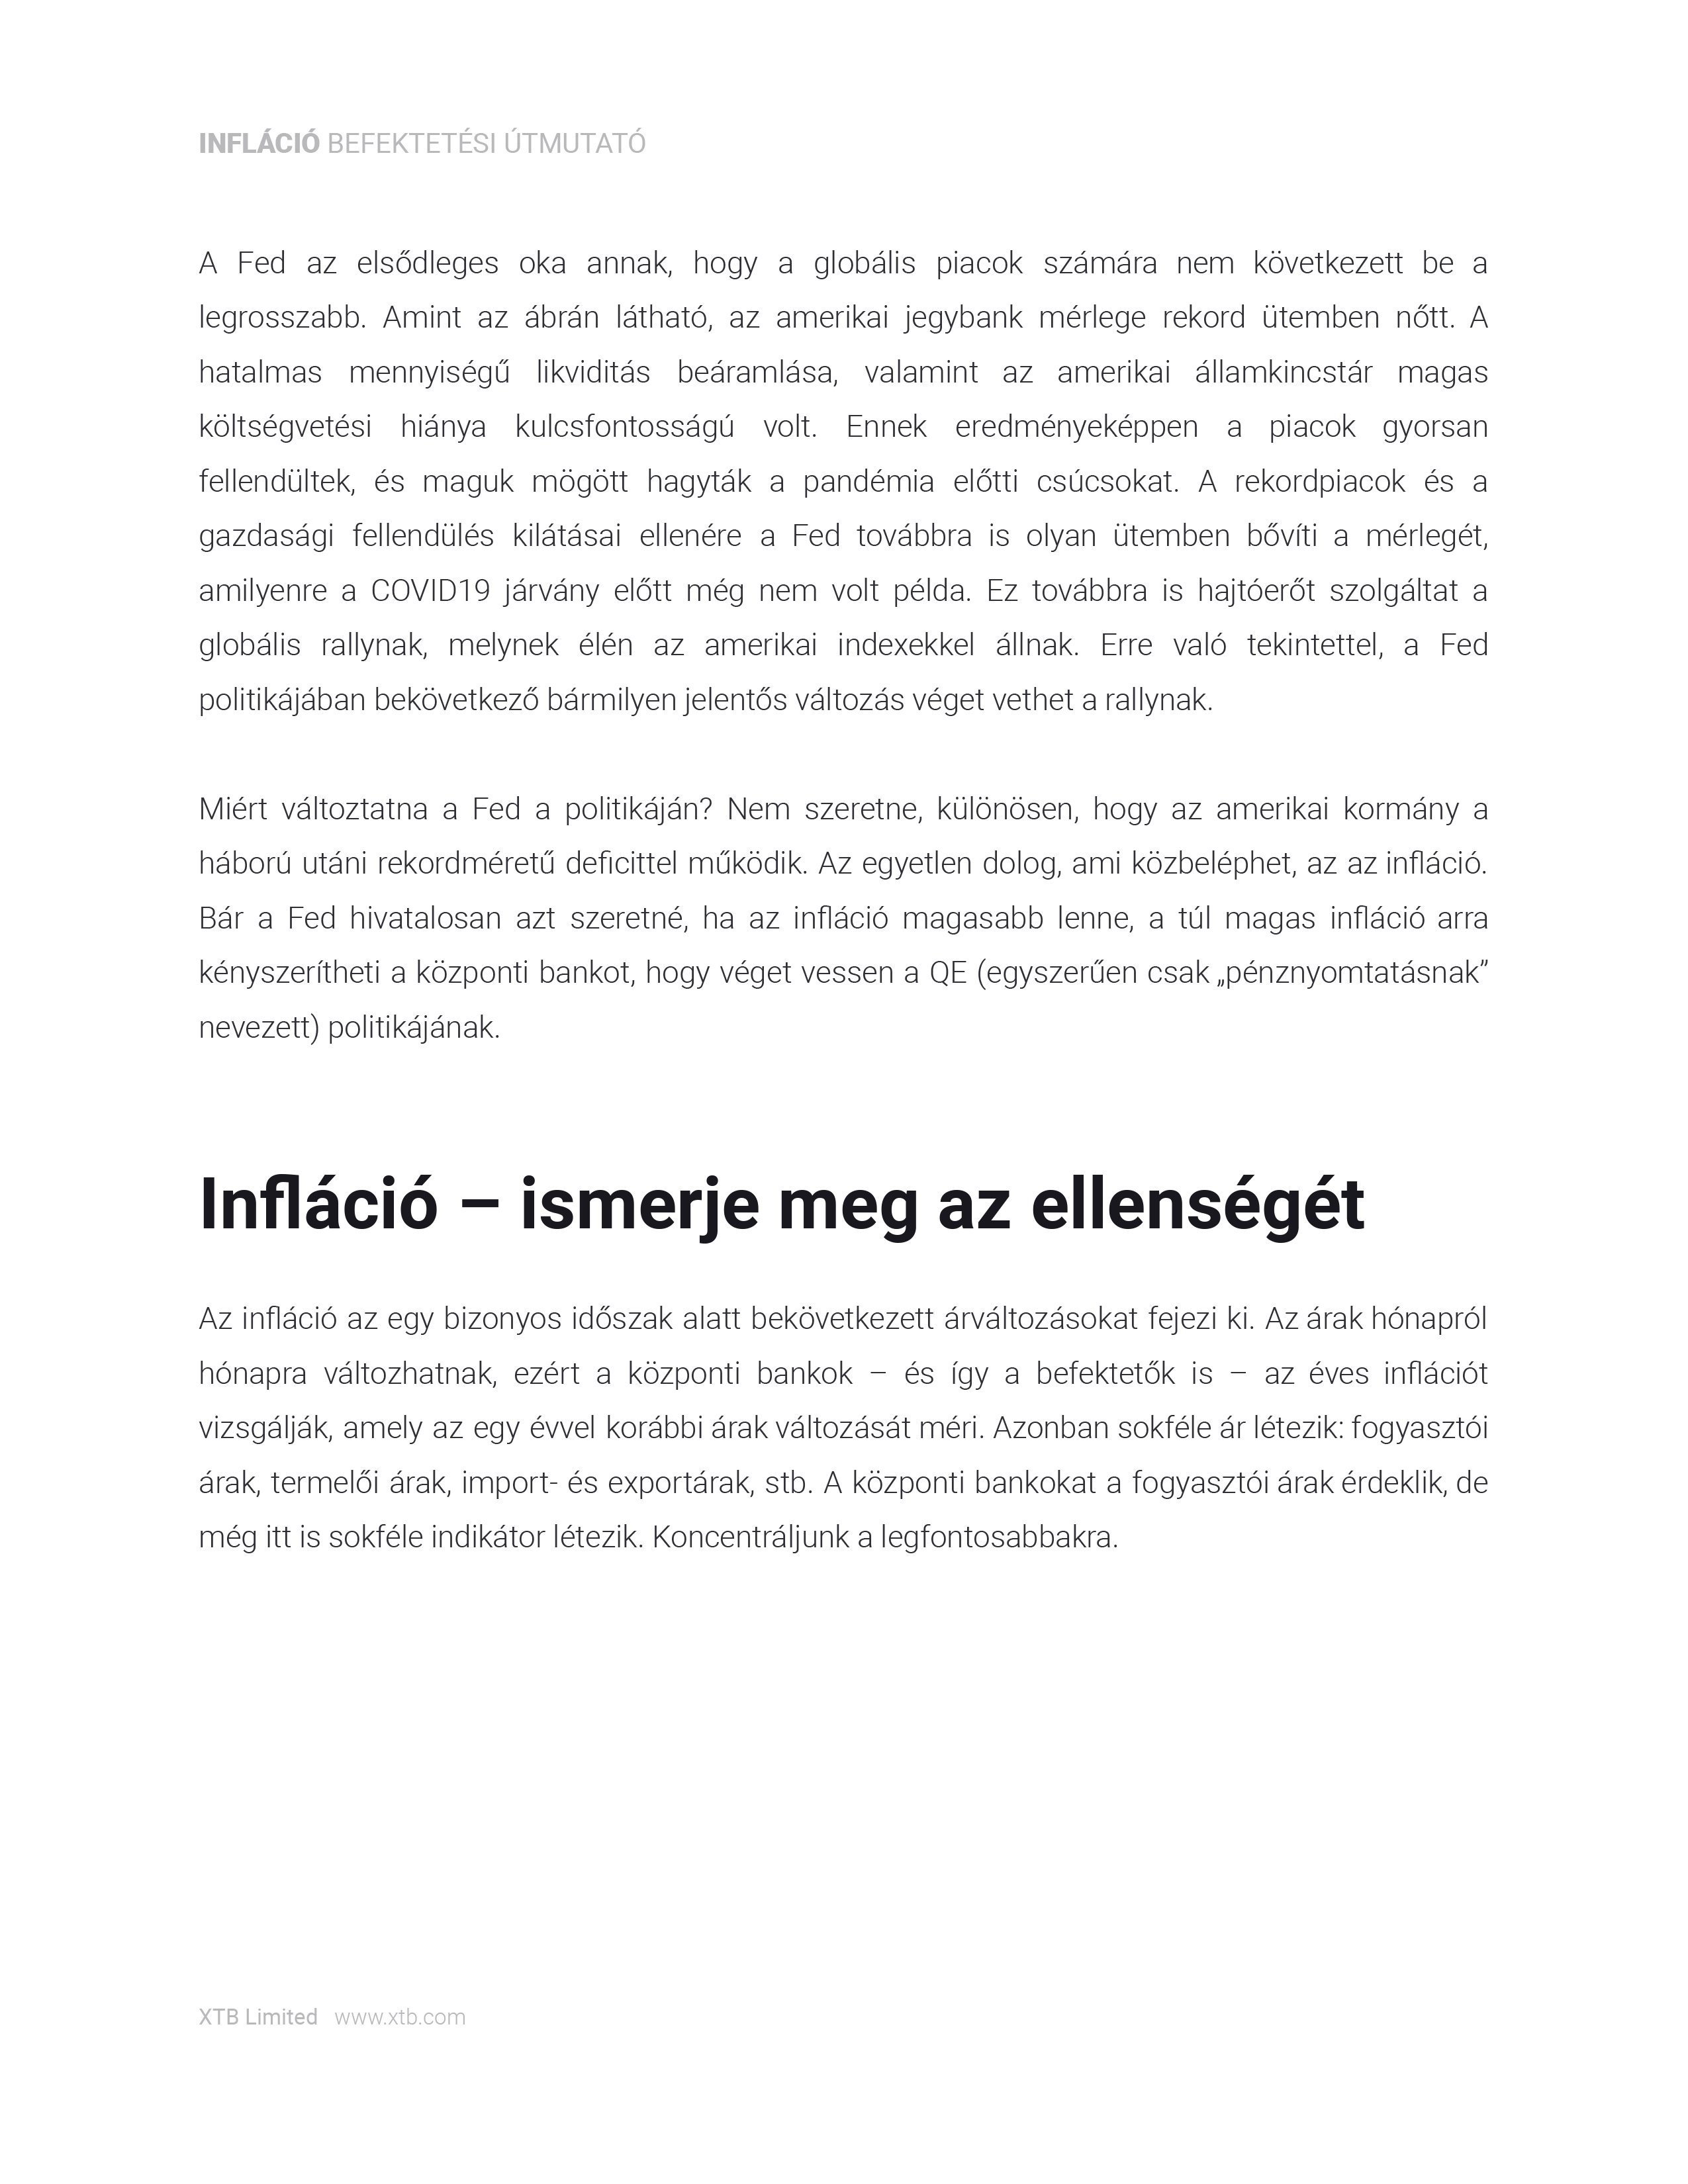 Inflation - Report HU-5